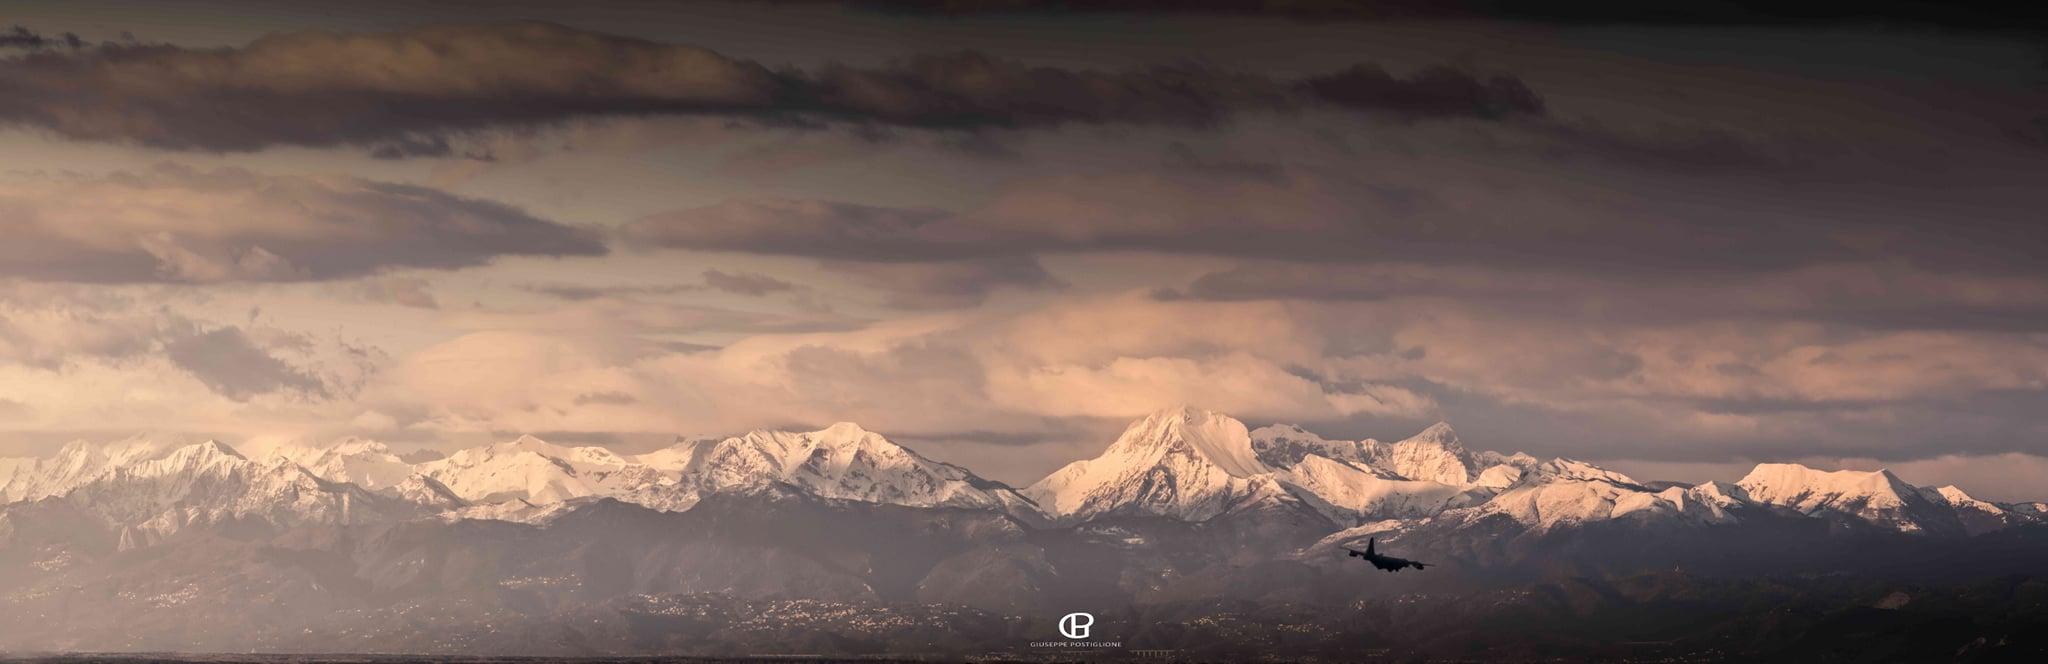 Alpi Apuane viste da Montenero